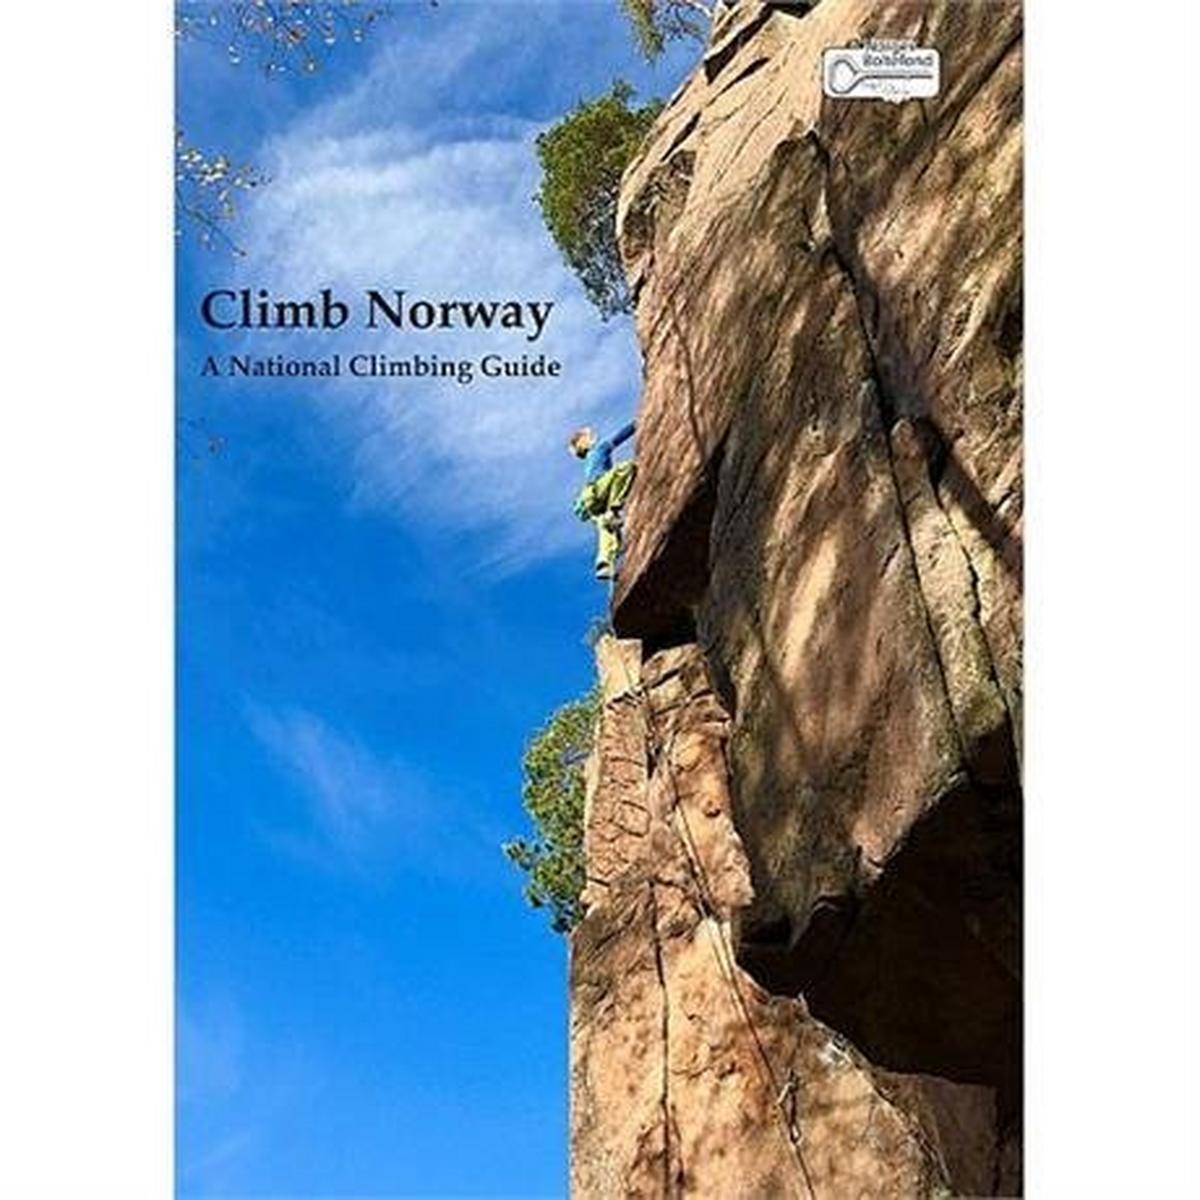 Miscellaneous Climbing Guide Book: Climb Norway - A National Climbing Guide